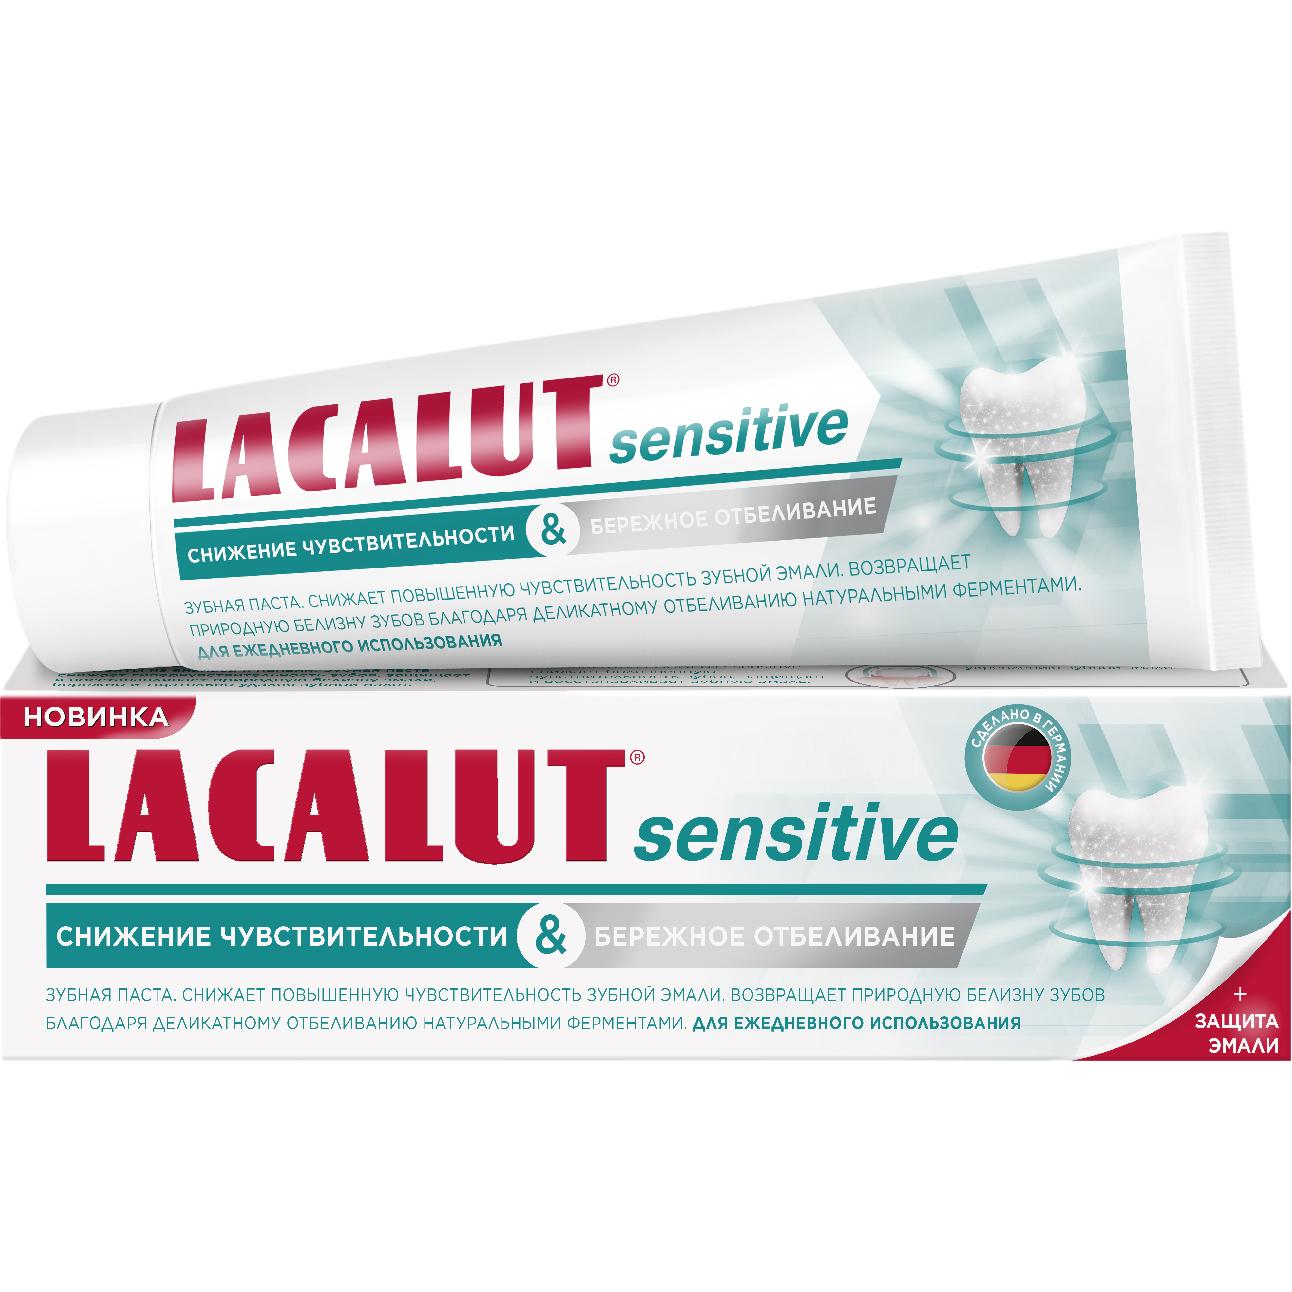 Зубная паста Lacalut Sensitive White 75 мл недорого